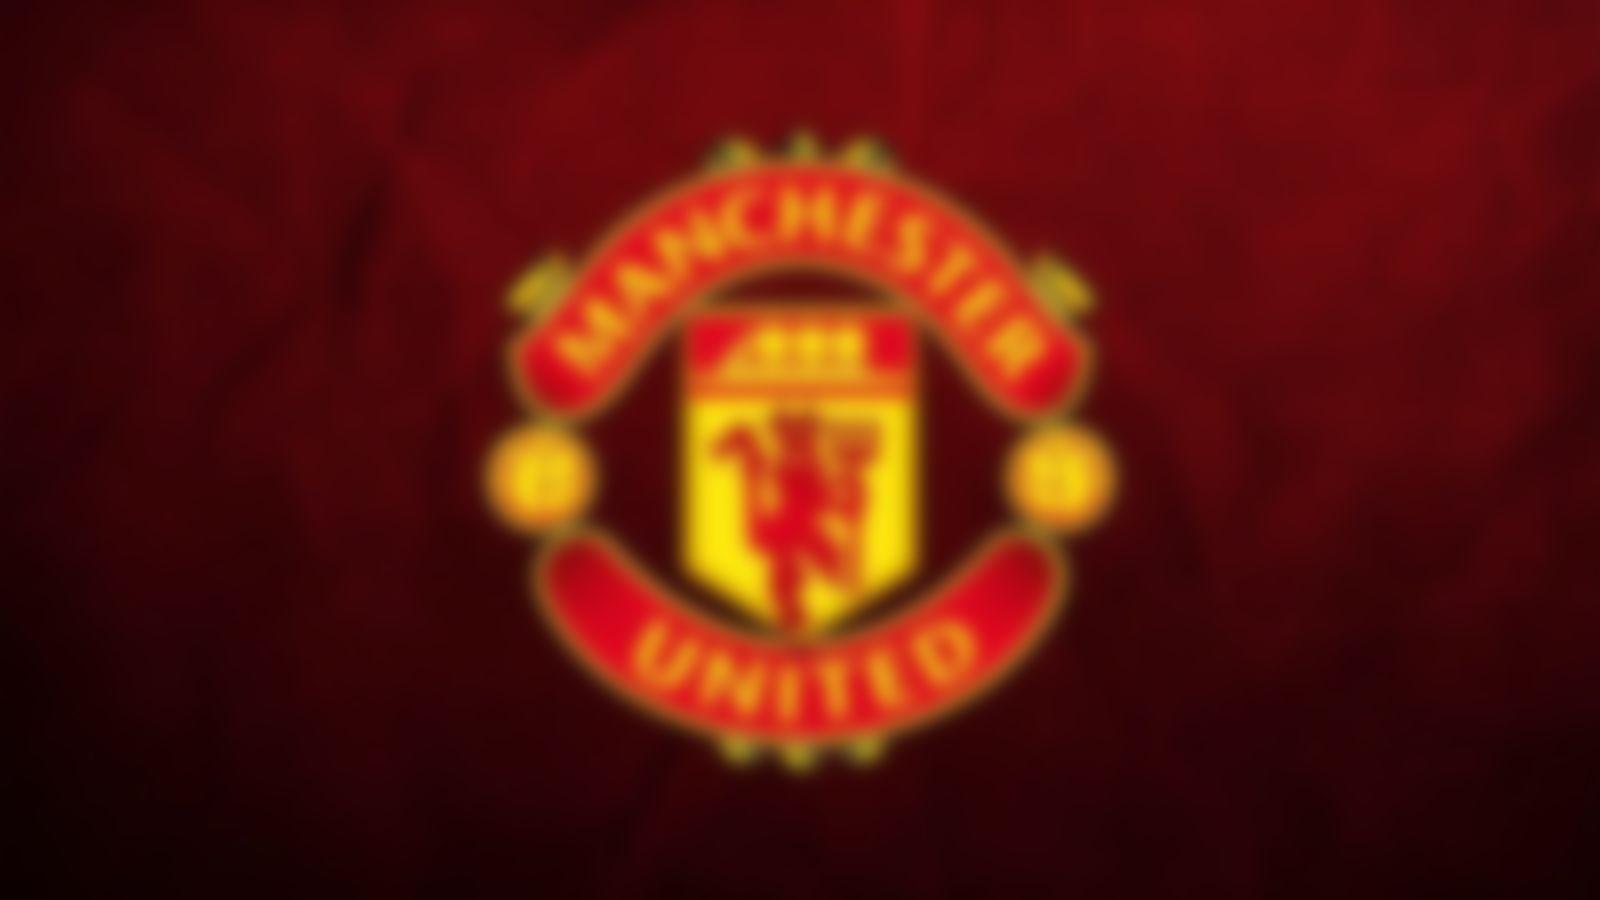 Manchester United Logo PC Wallpaper 4K HD 2020